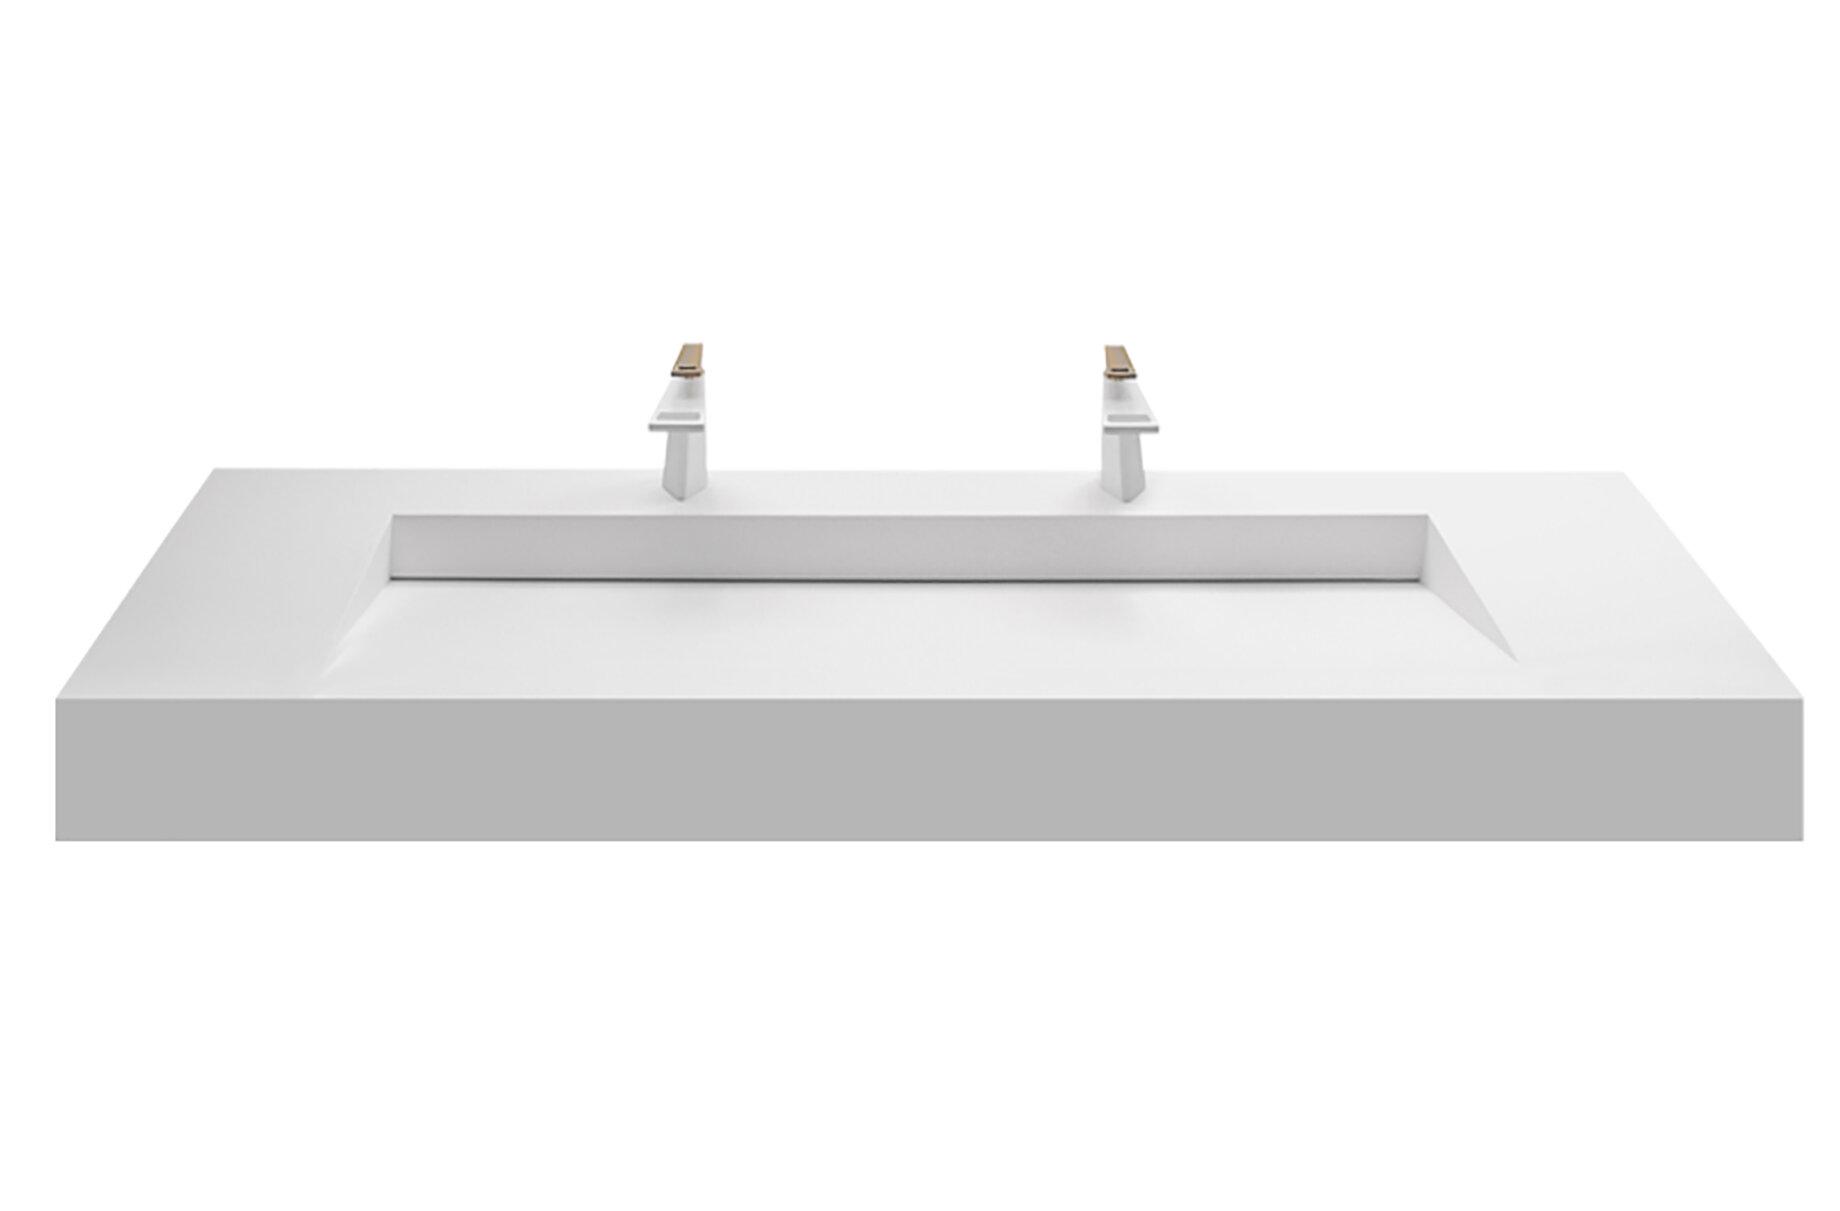 Orren Ellis Boyter Stone Rectangular Wall Mount Bathroom Sink 2 X Faucet Holes 60 L X 19 W Reviews Wayfair